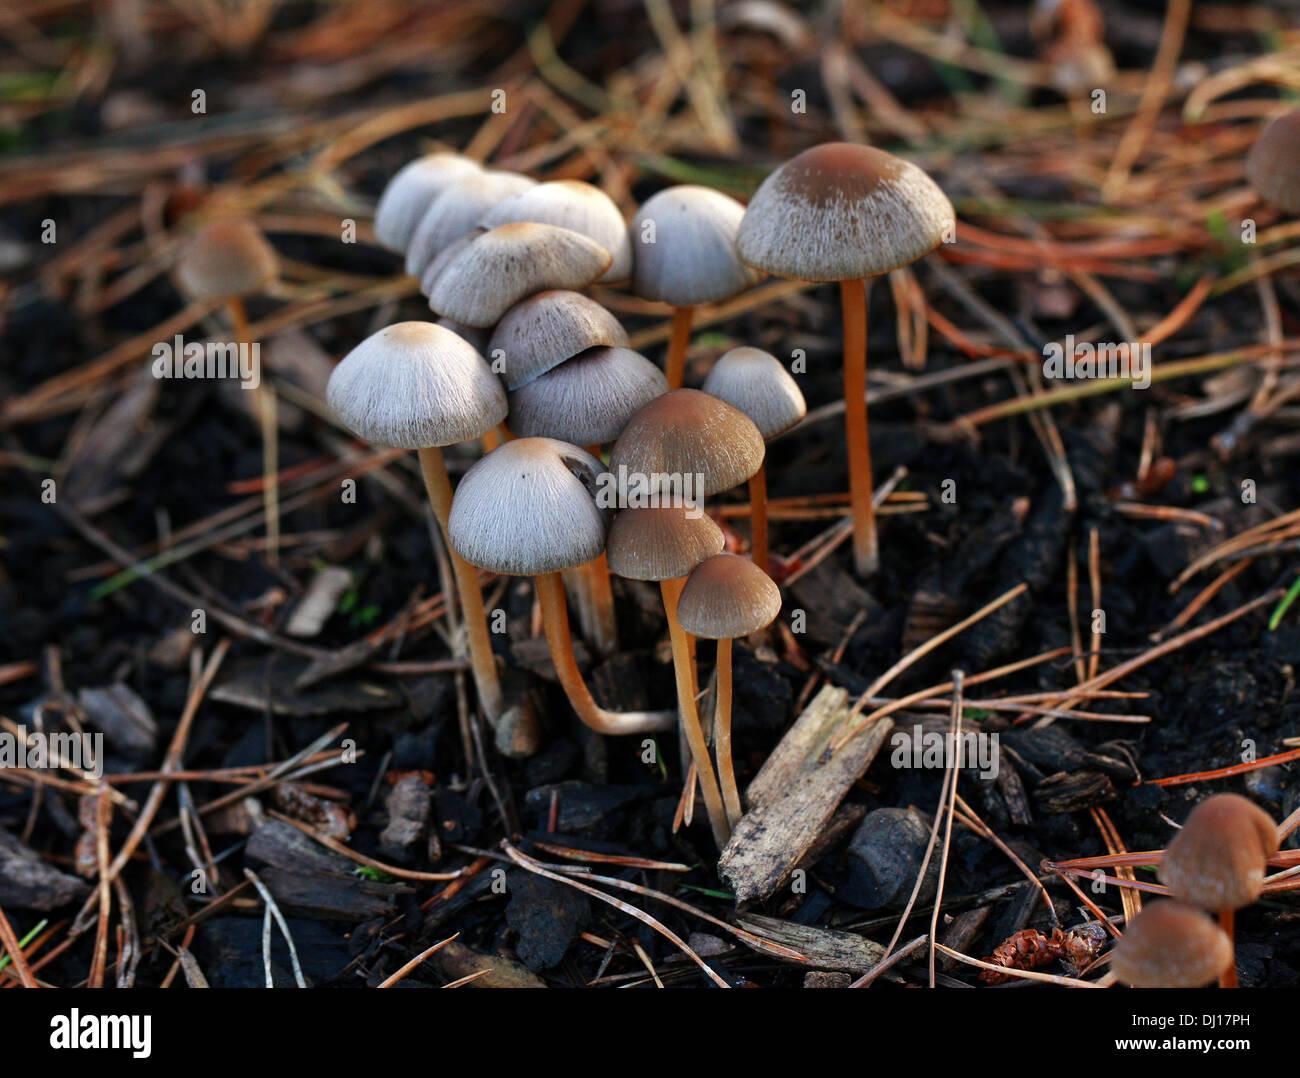 Reddish-spotted Mycena Mushrooms, Mycena maculata, Mycenaceae. Growing on Pine Bark Chippings. - Stock Image